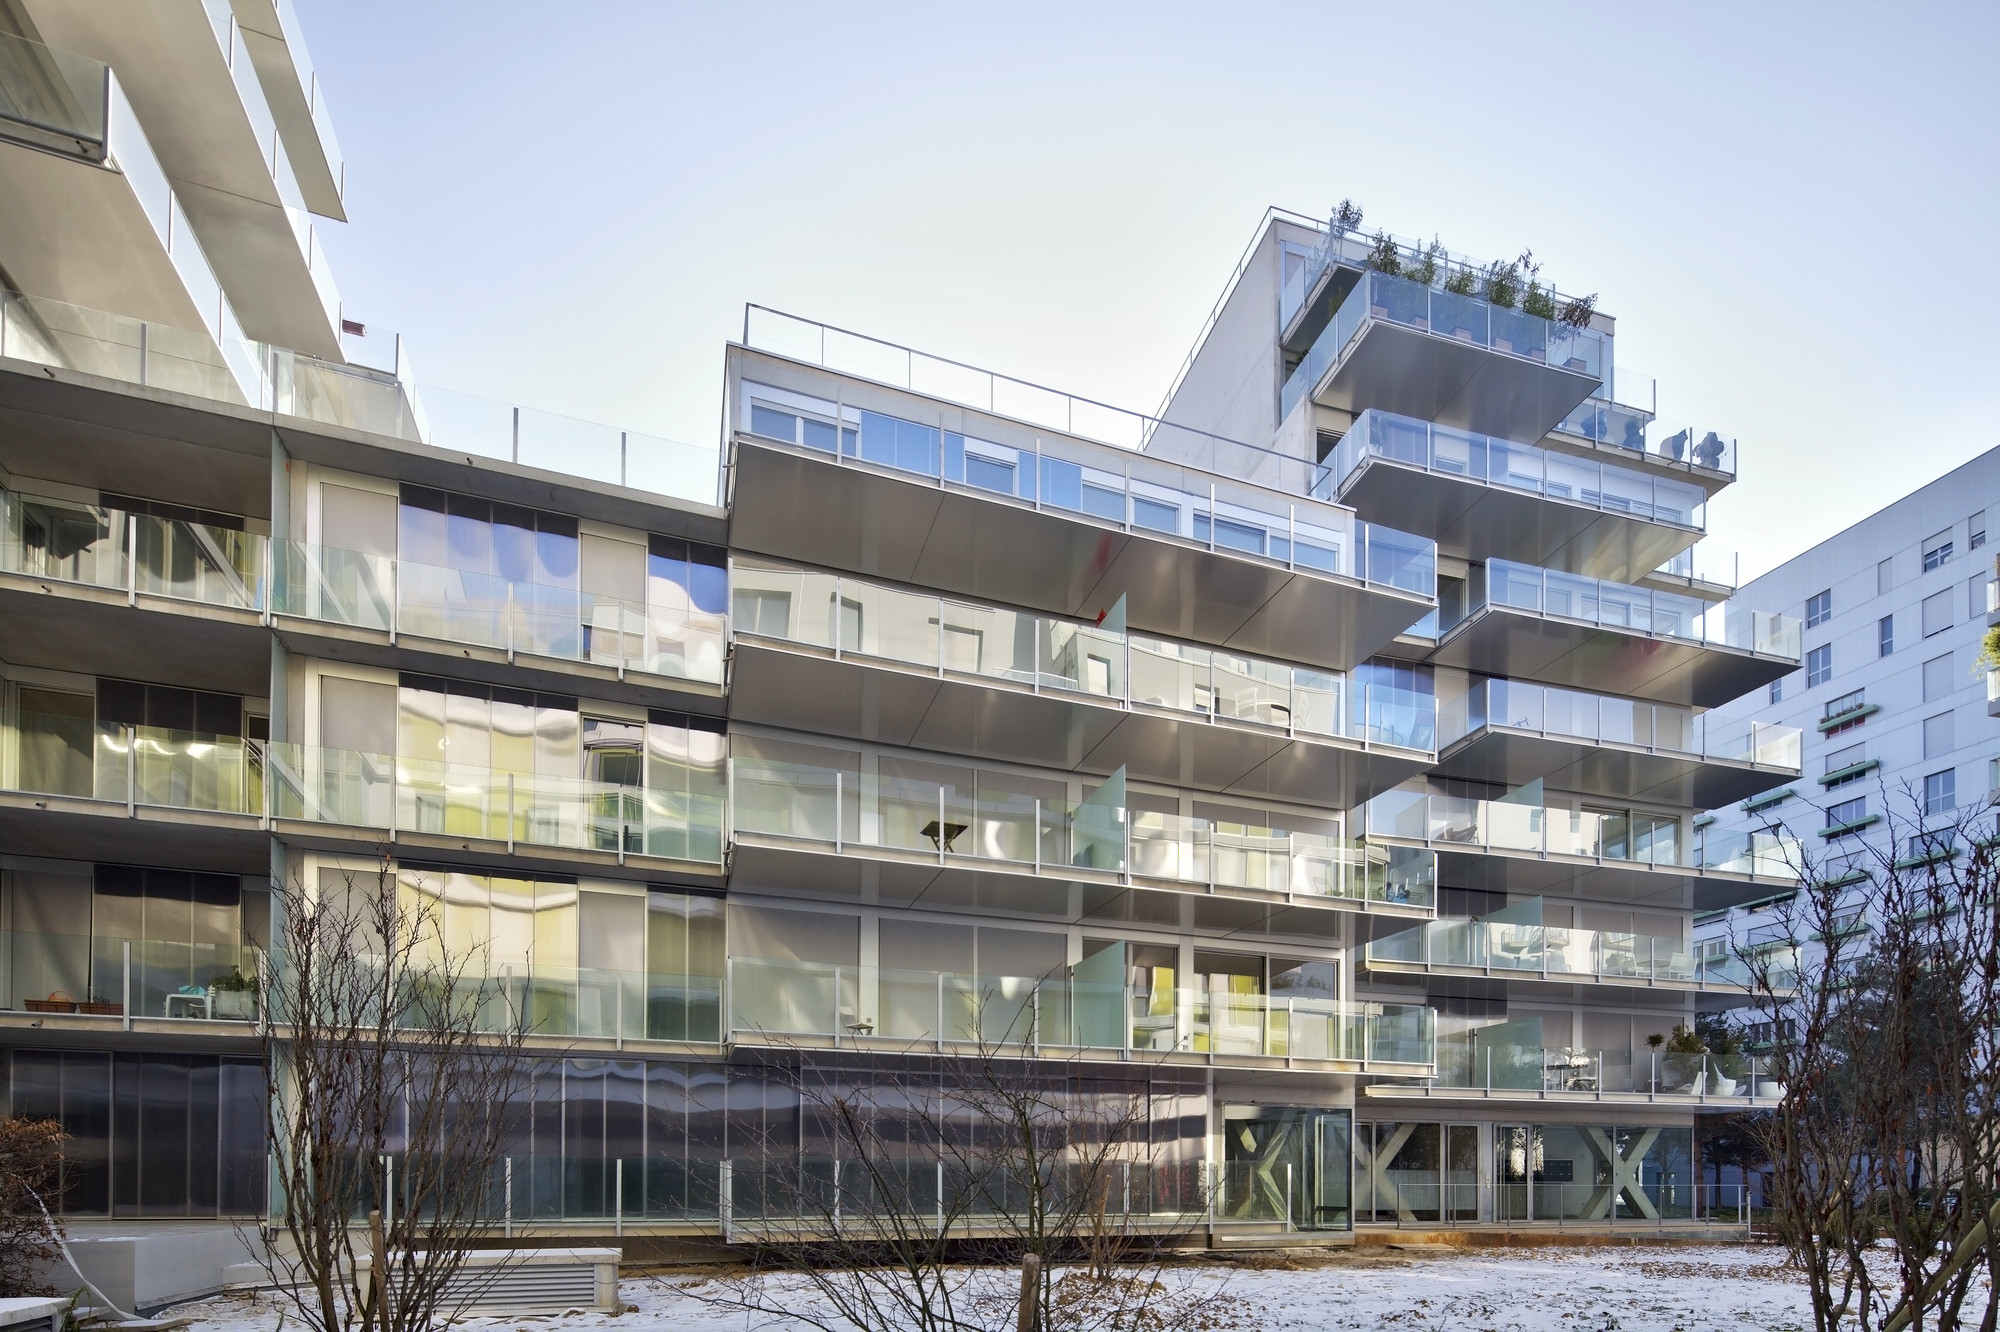 73 apartments ZAC Seguin Rives de Seine - Lot B3B / Philippe Dubus Architectes